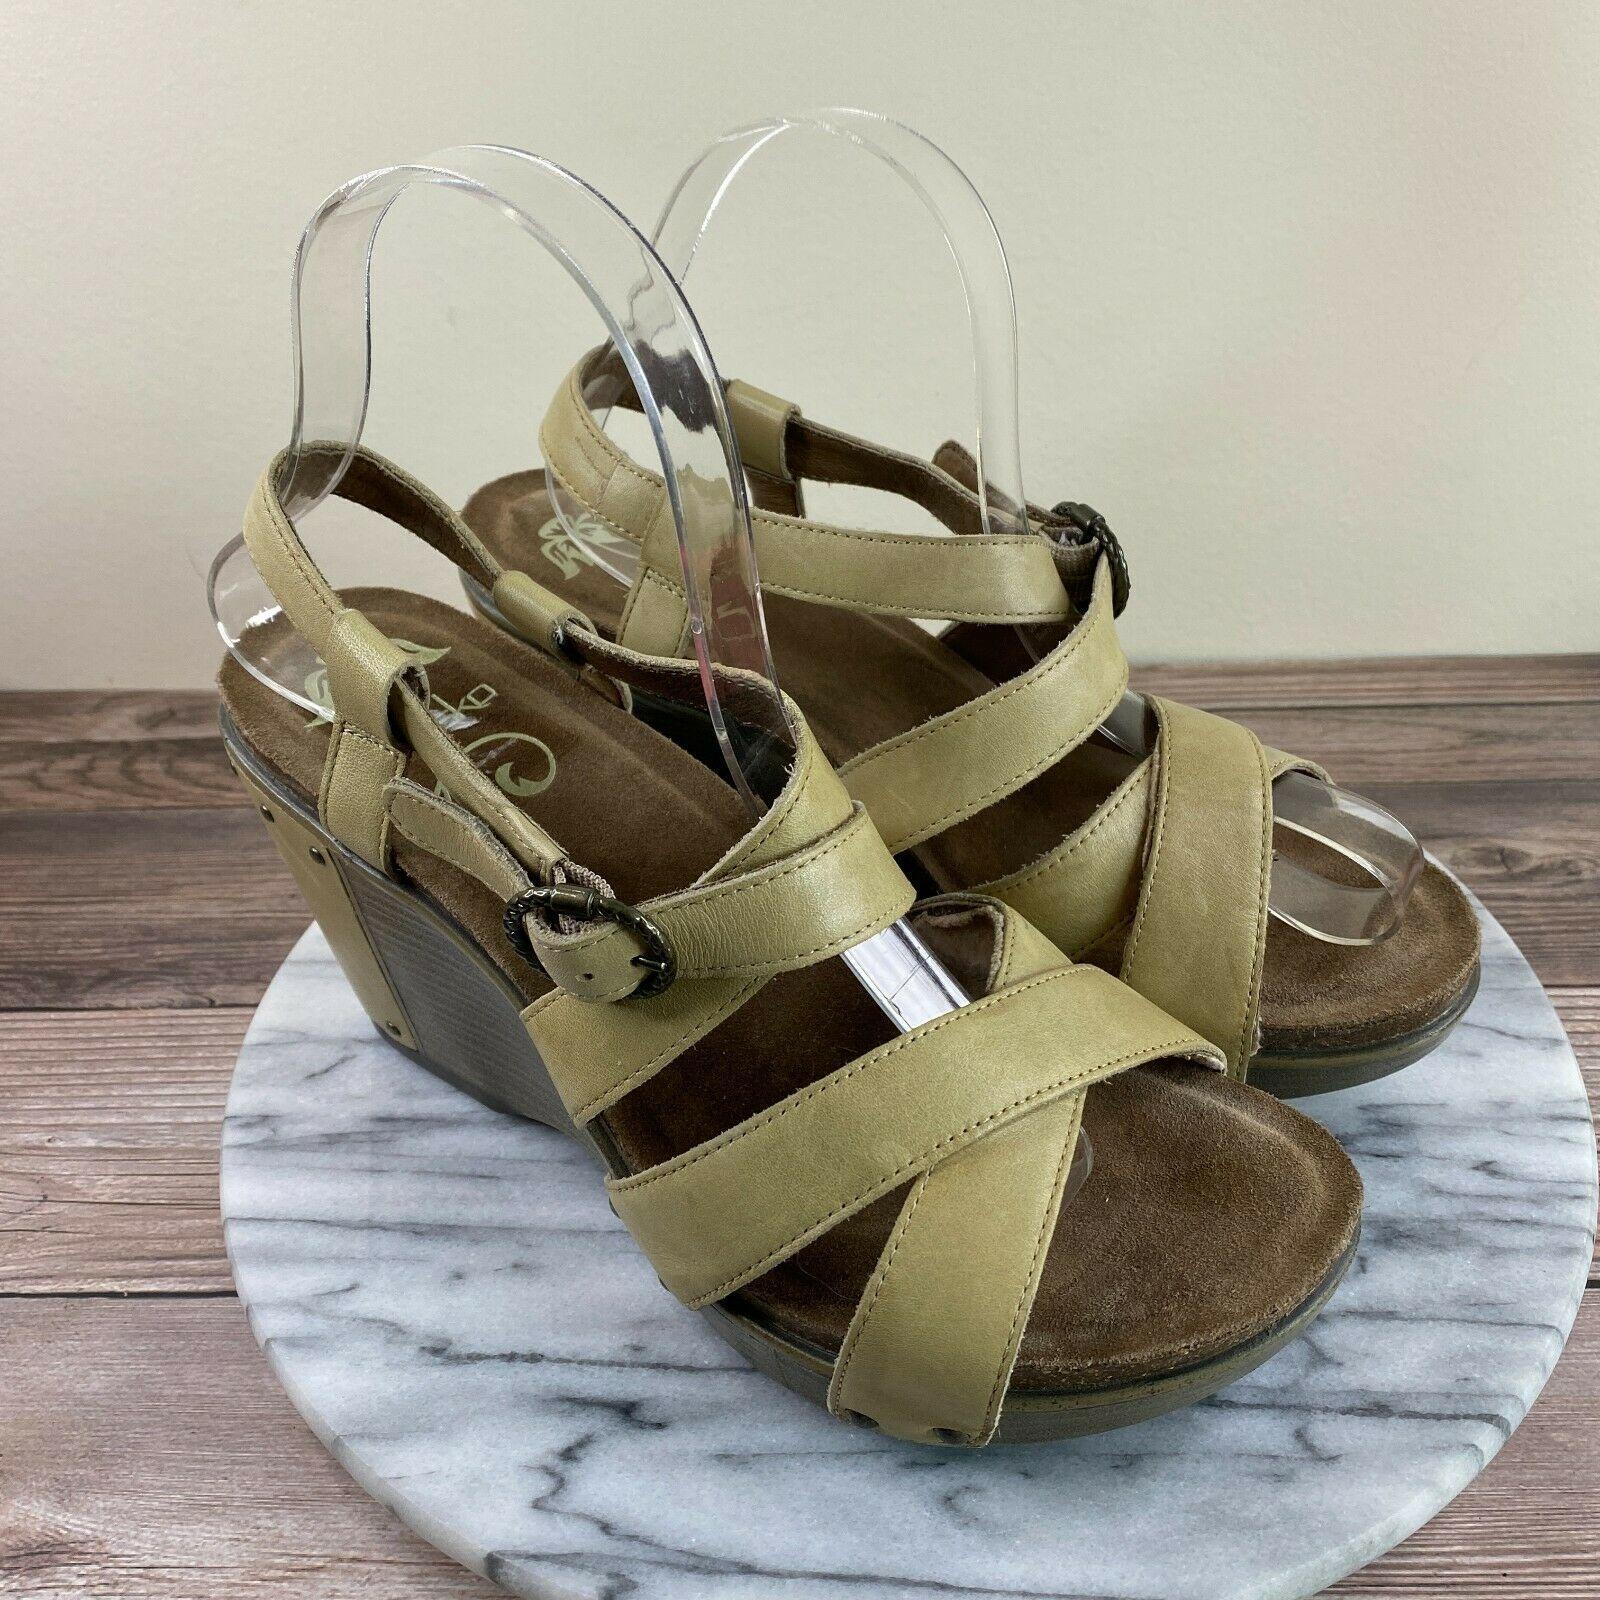 Dansko Frida Beige Leather Criss Cross Strappy Wedge Sandals Womens Size 39/8.5 - $49.95